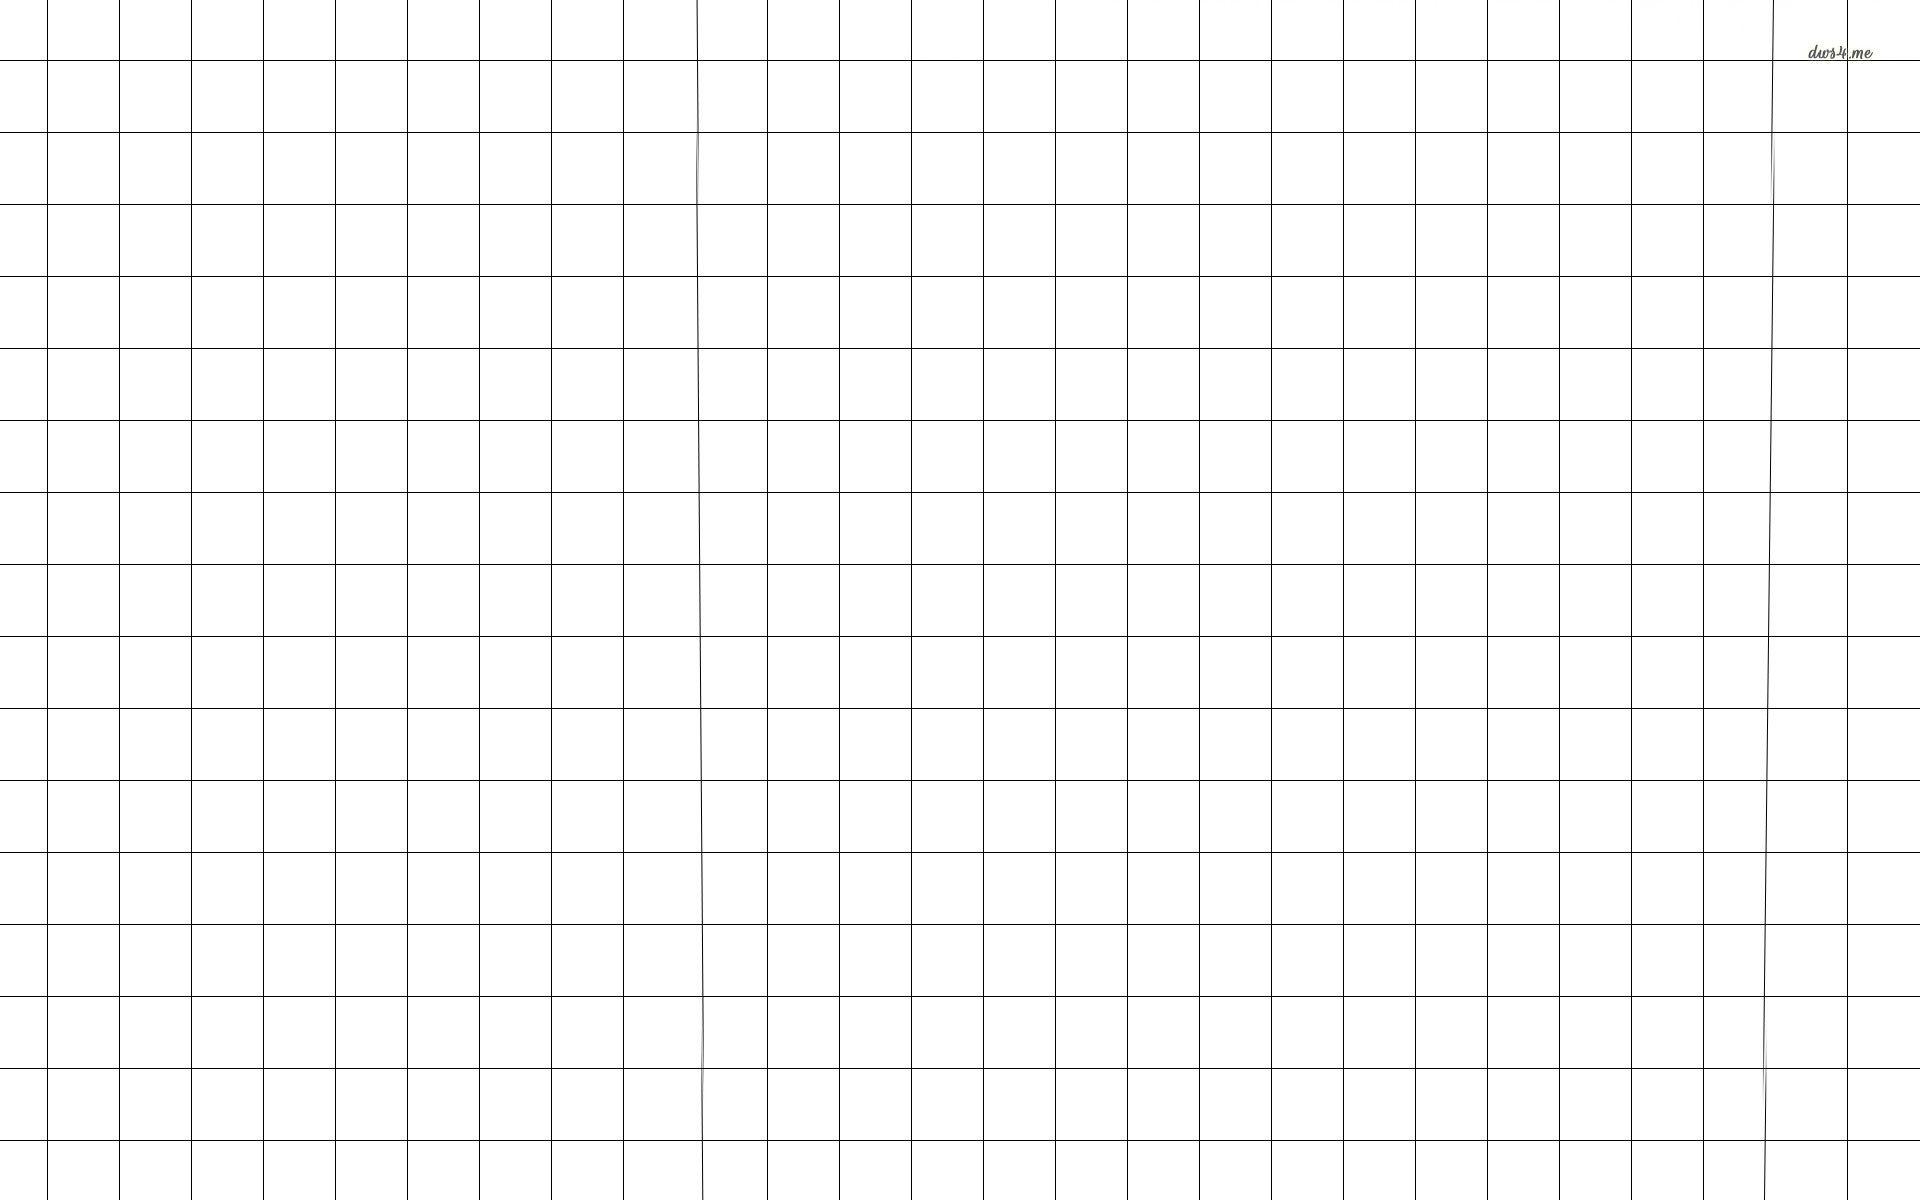 Aesthetic Grid Laptop Wallpapers   Top Aesthetic Grid Laptop 1920x1200